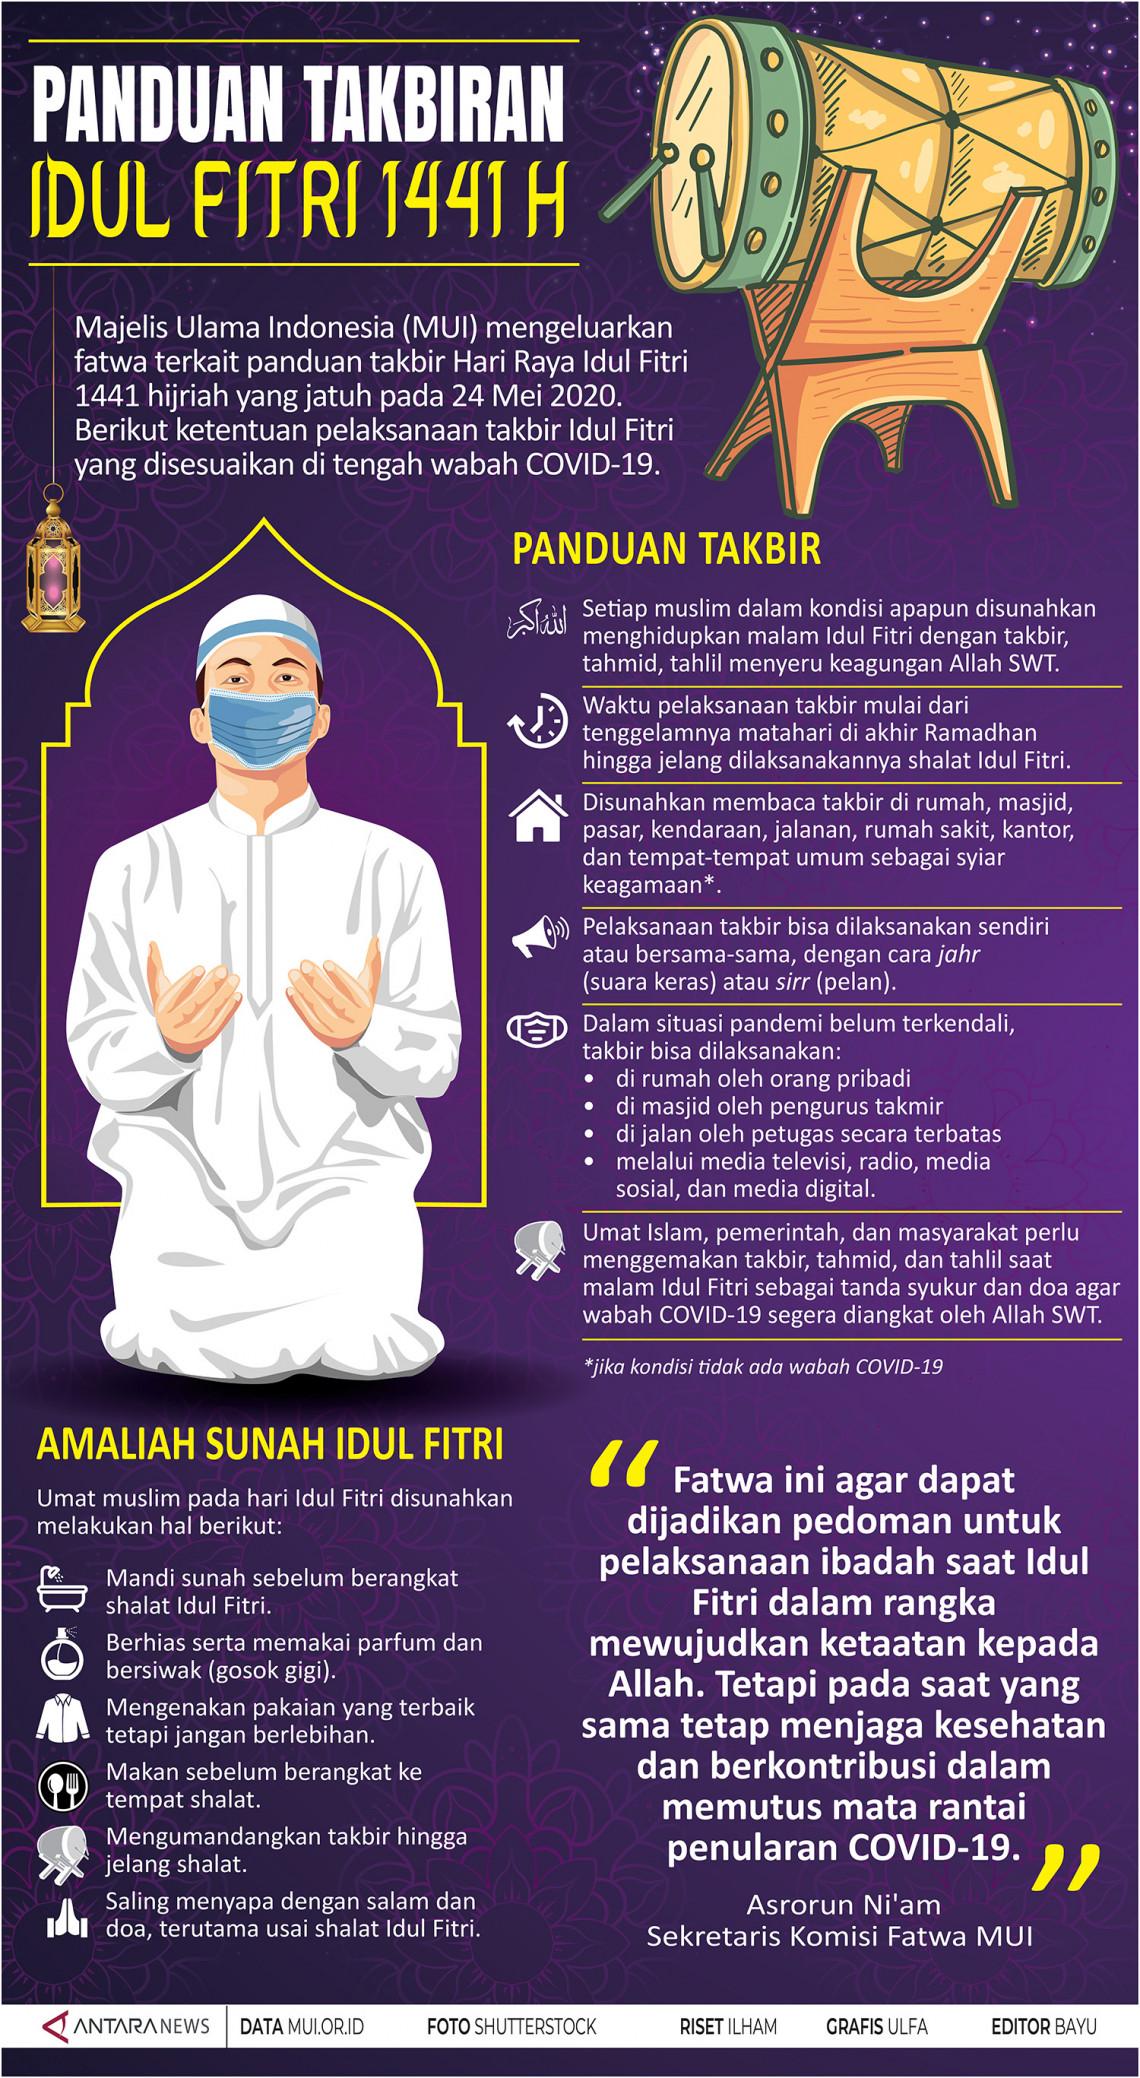 Gambar Idul Fitri 1441 : gambar, fitri, Infografik, Panduan, Takbiran, Fitri, ANTARA